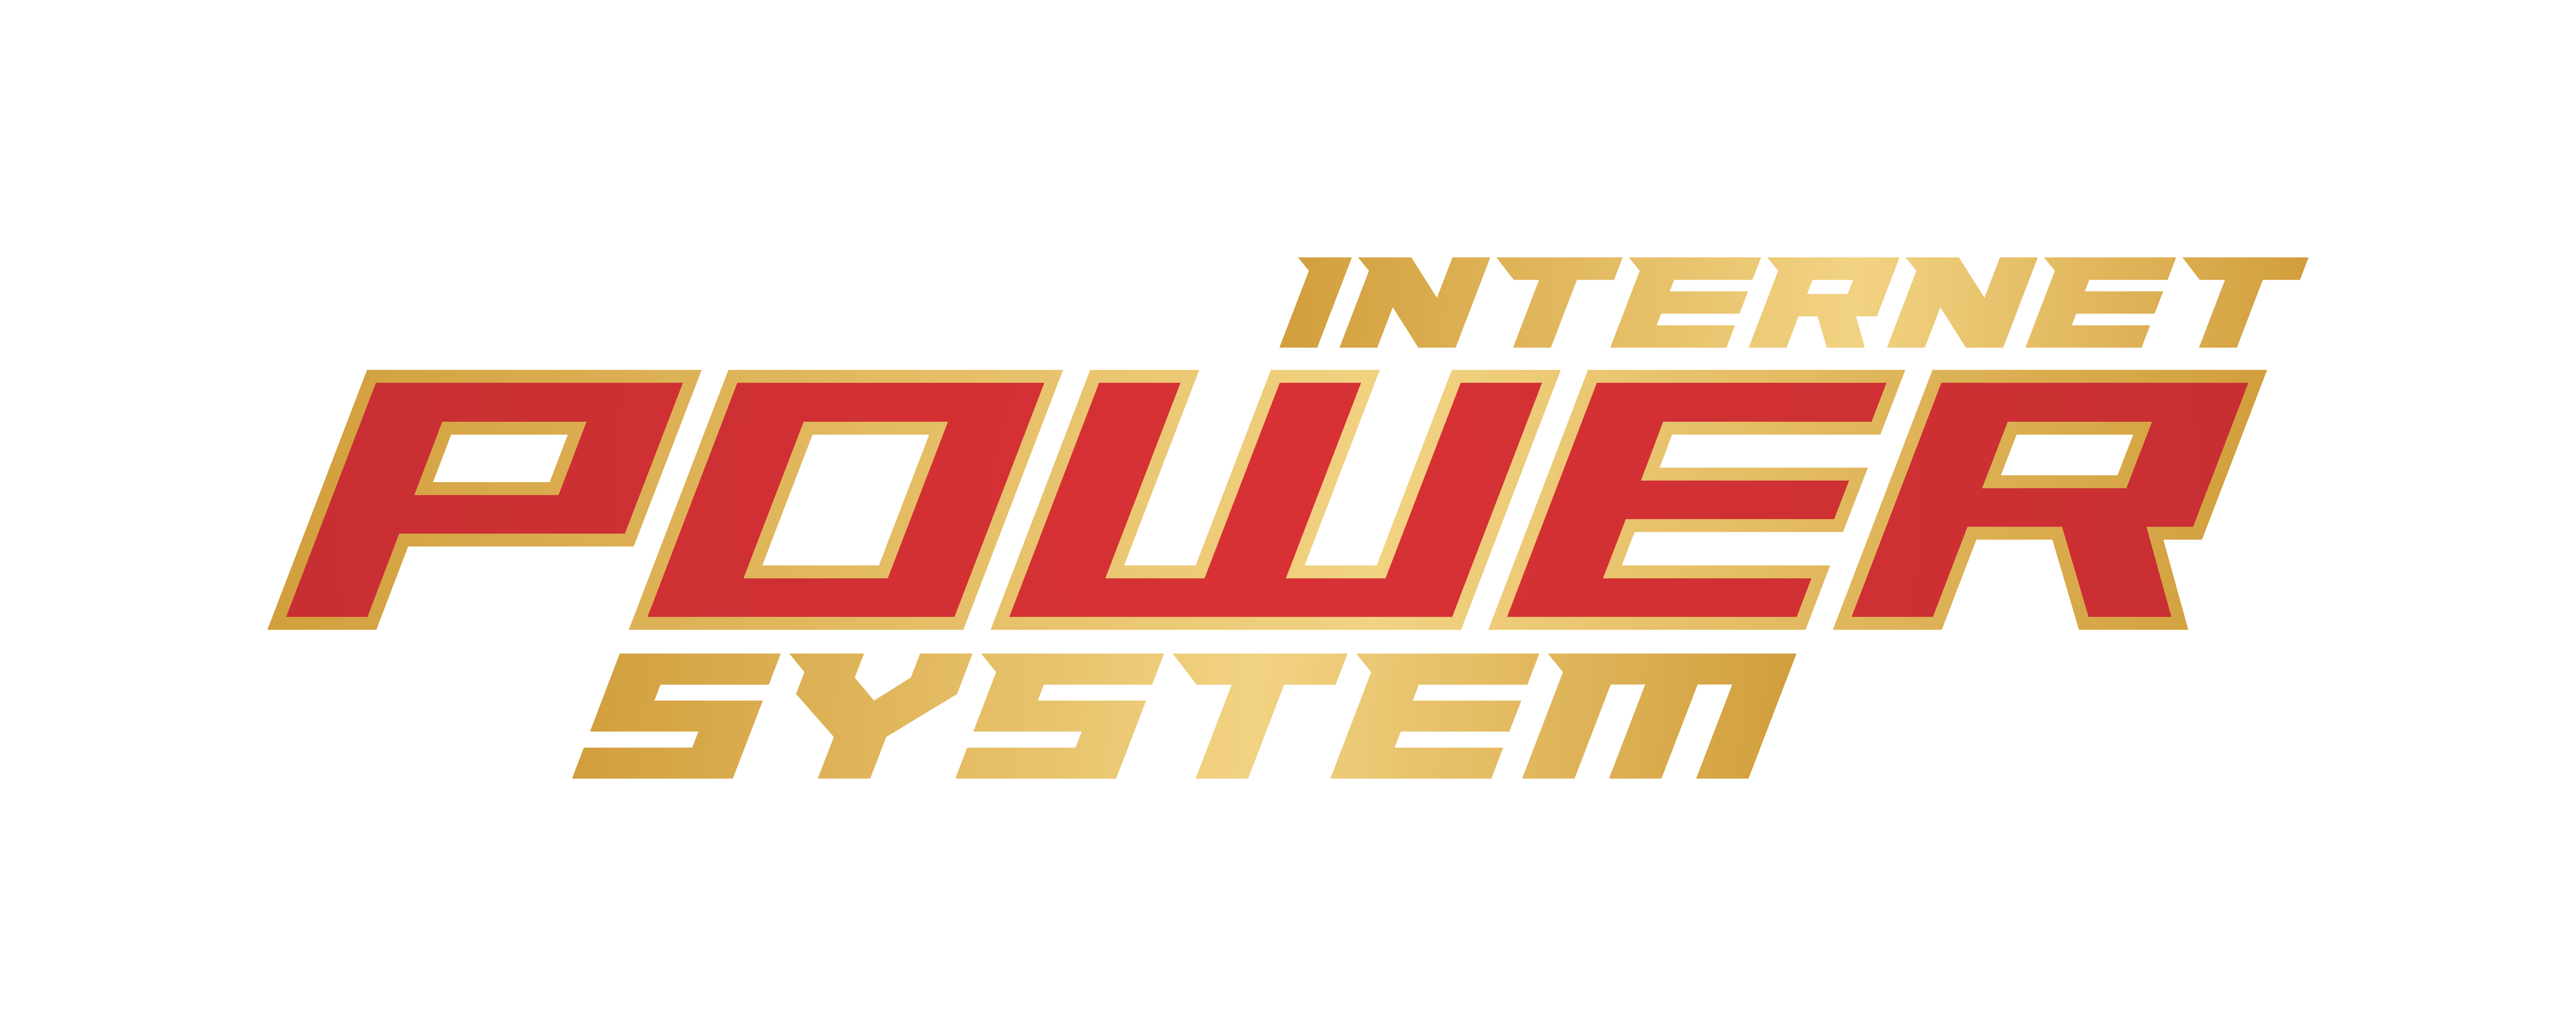 Khóa học Internet Power System